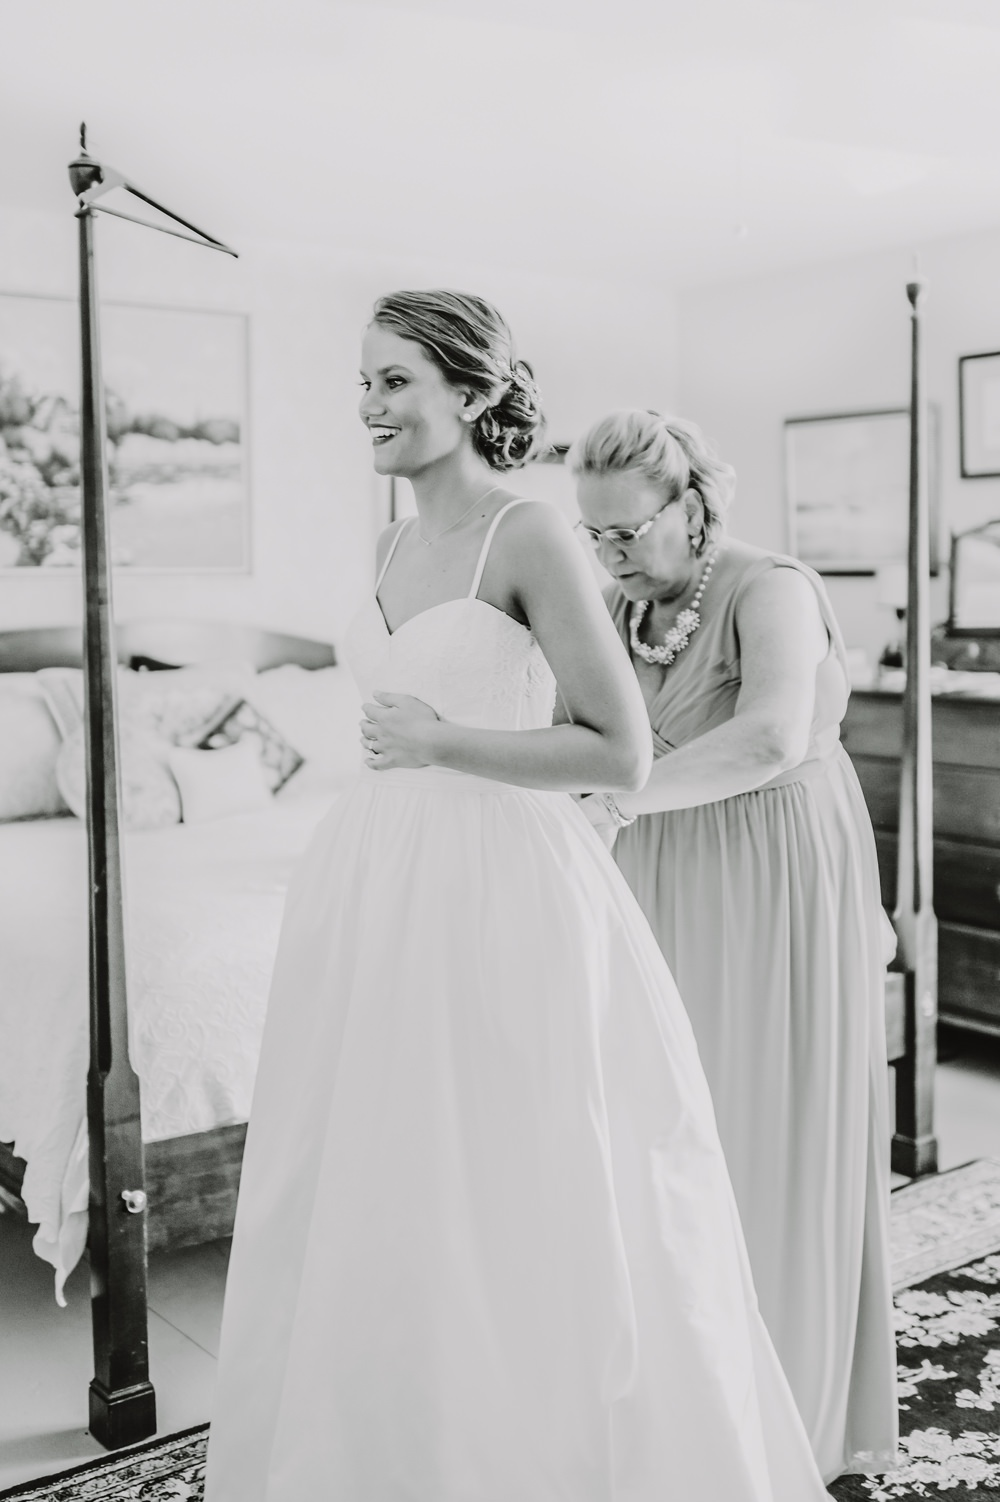 Dress Gown Bride Bridal Princess Straps Maryland Wedding L. Hewitt Photography